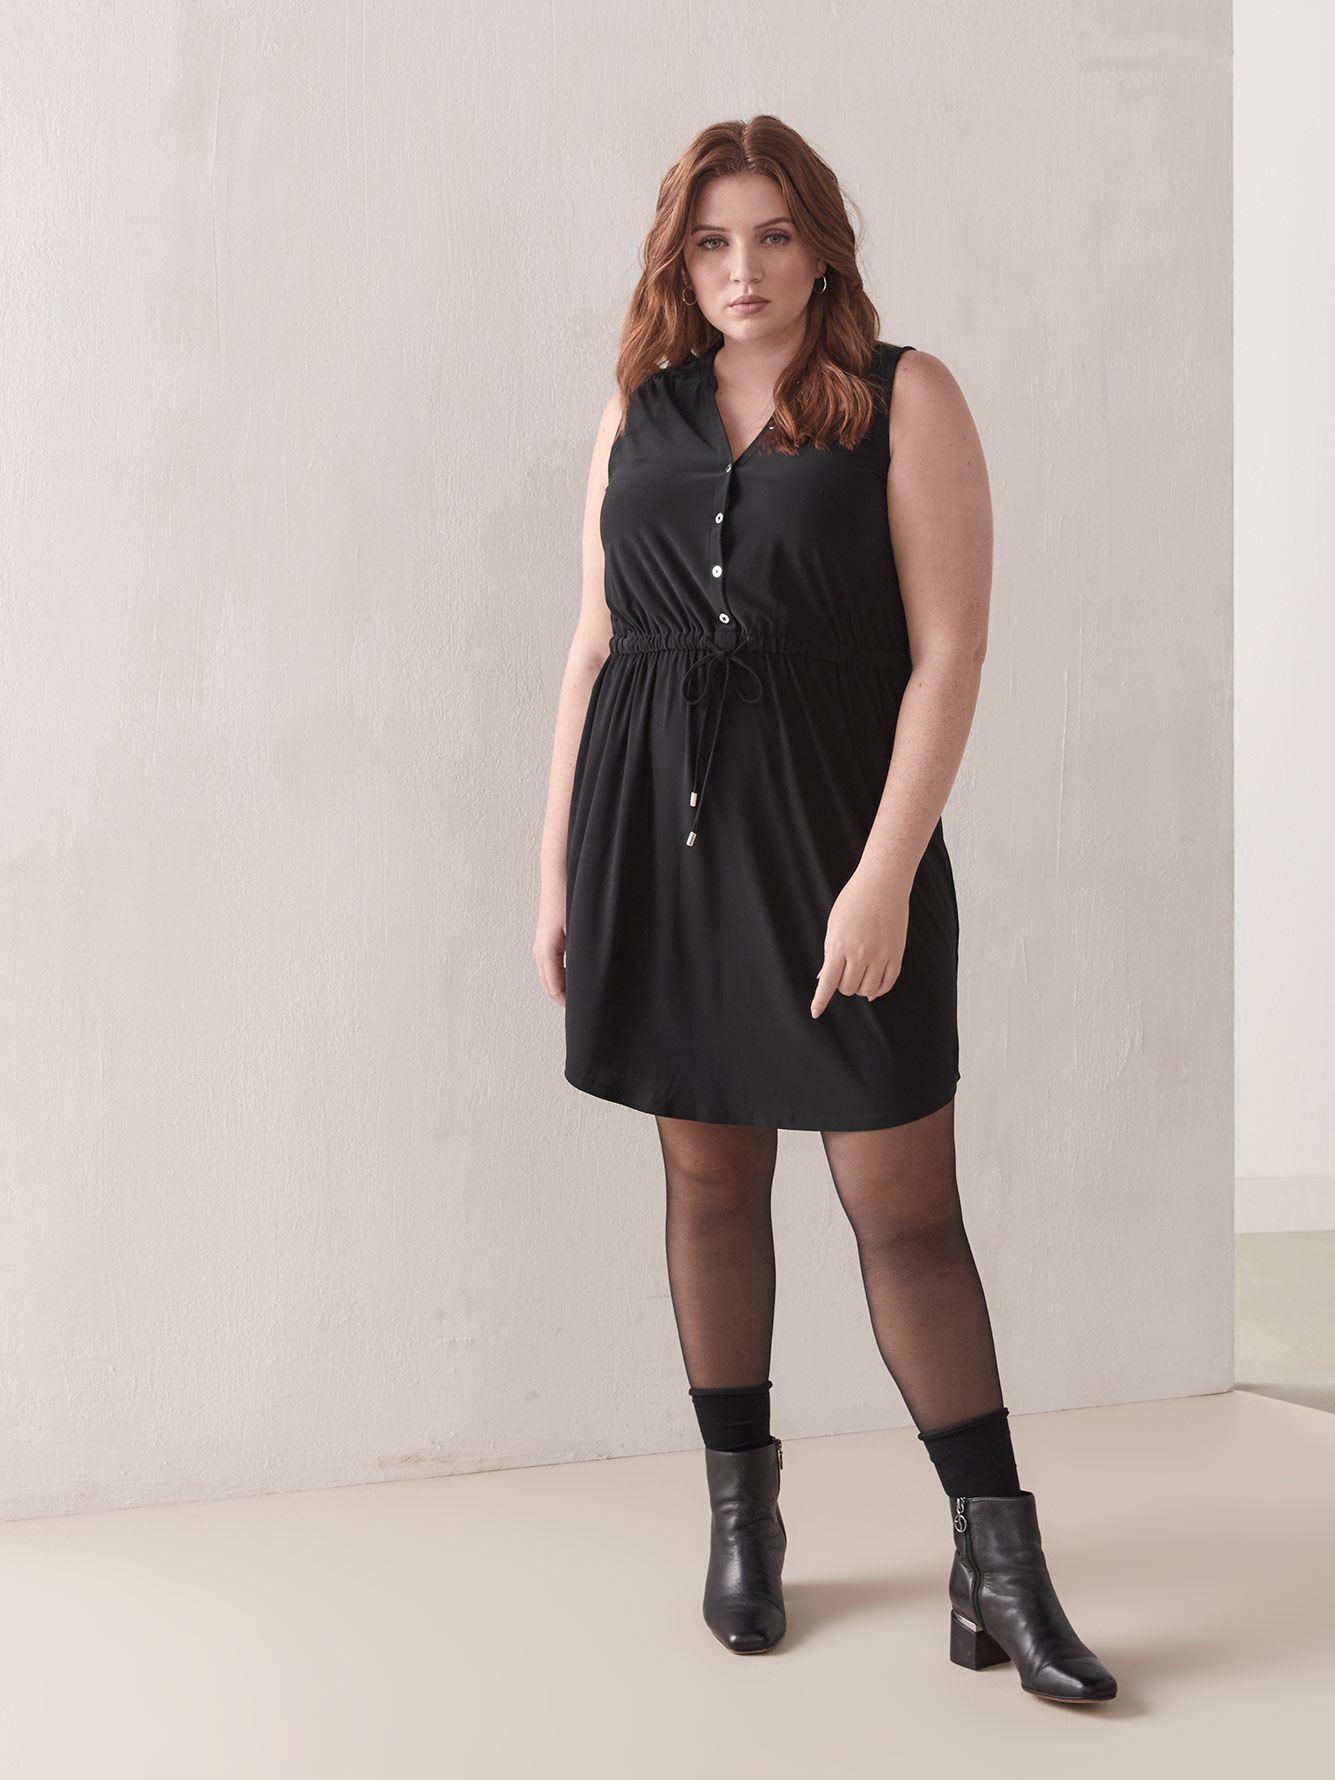 Sleeveless Shirt Dress - Addition Elle 2